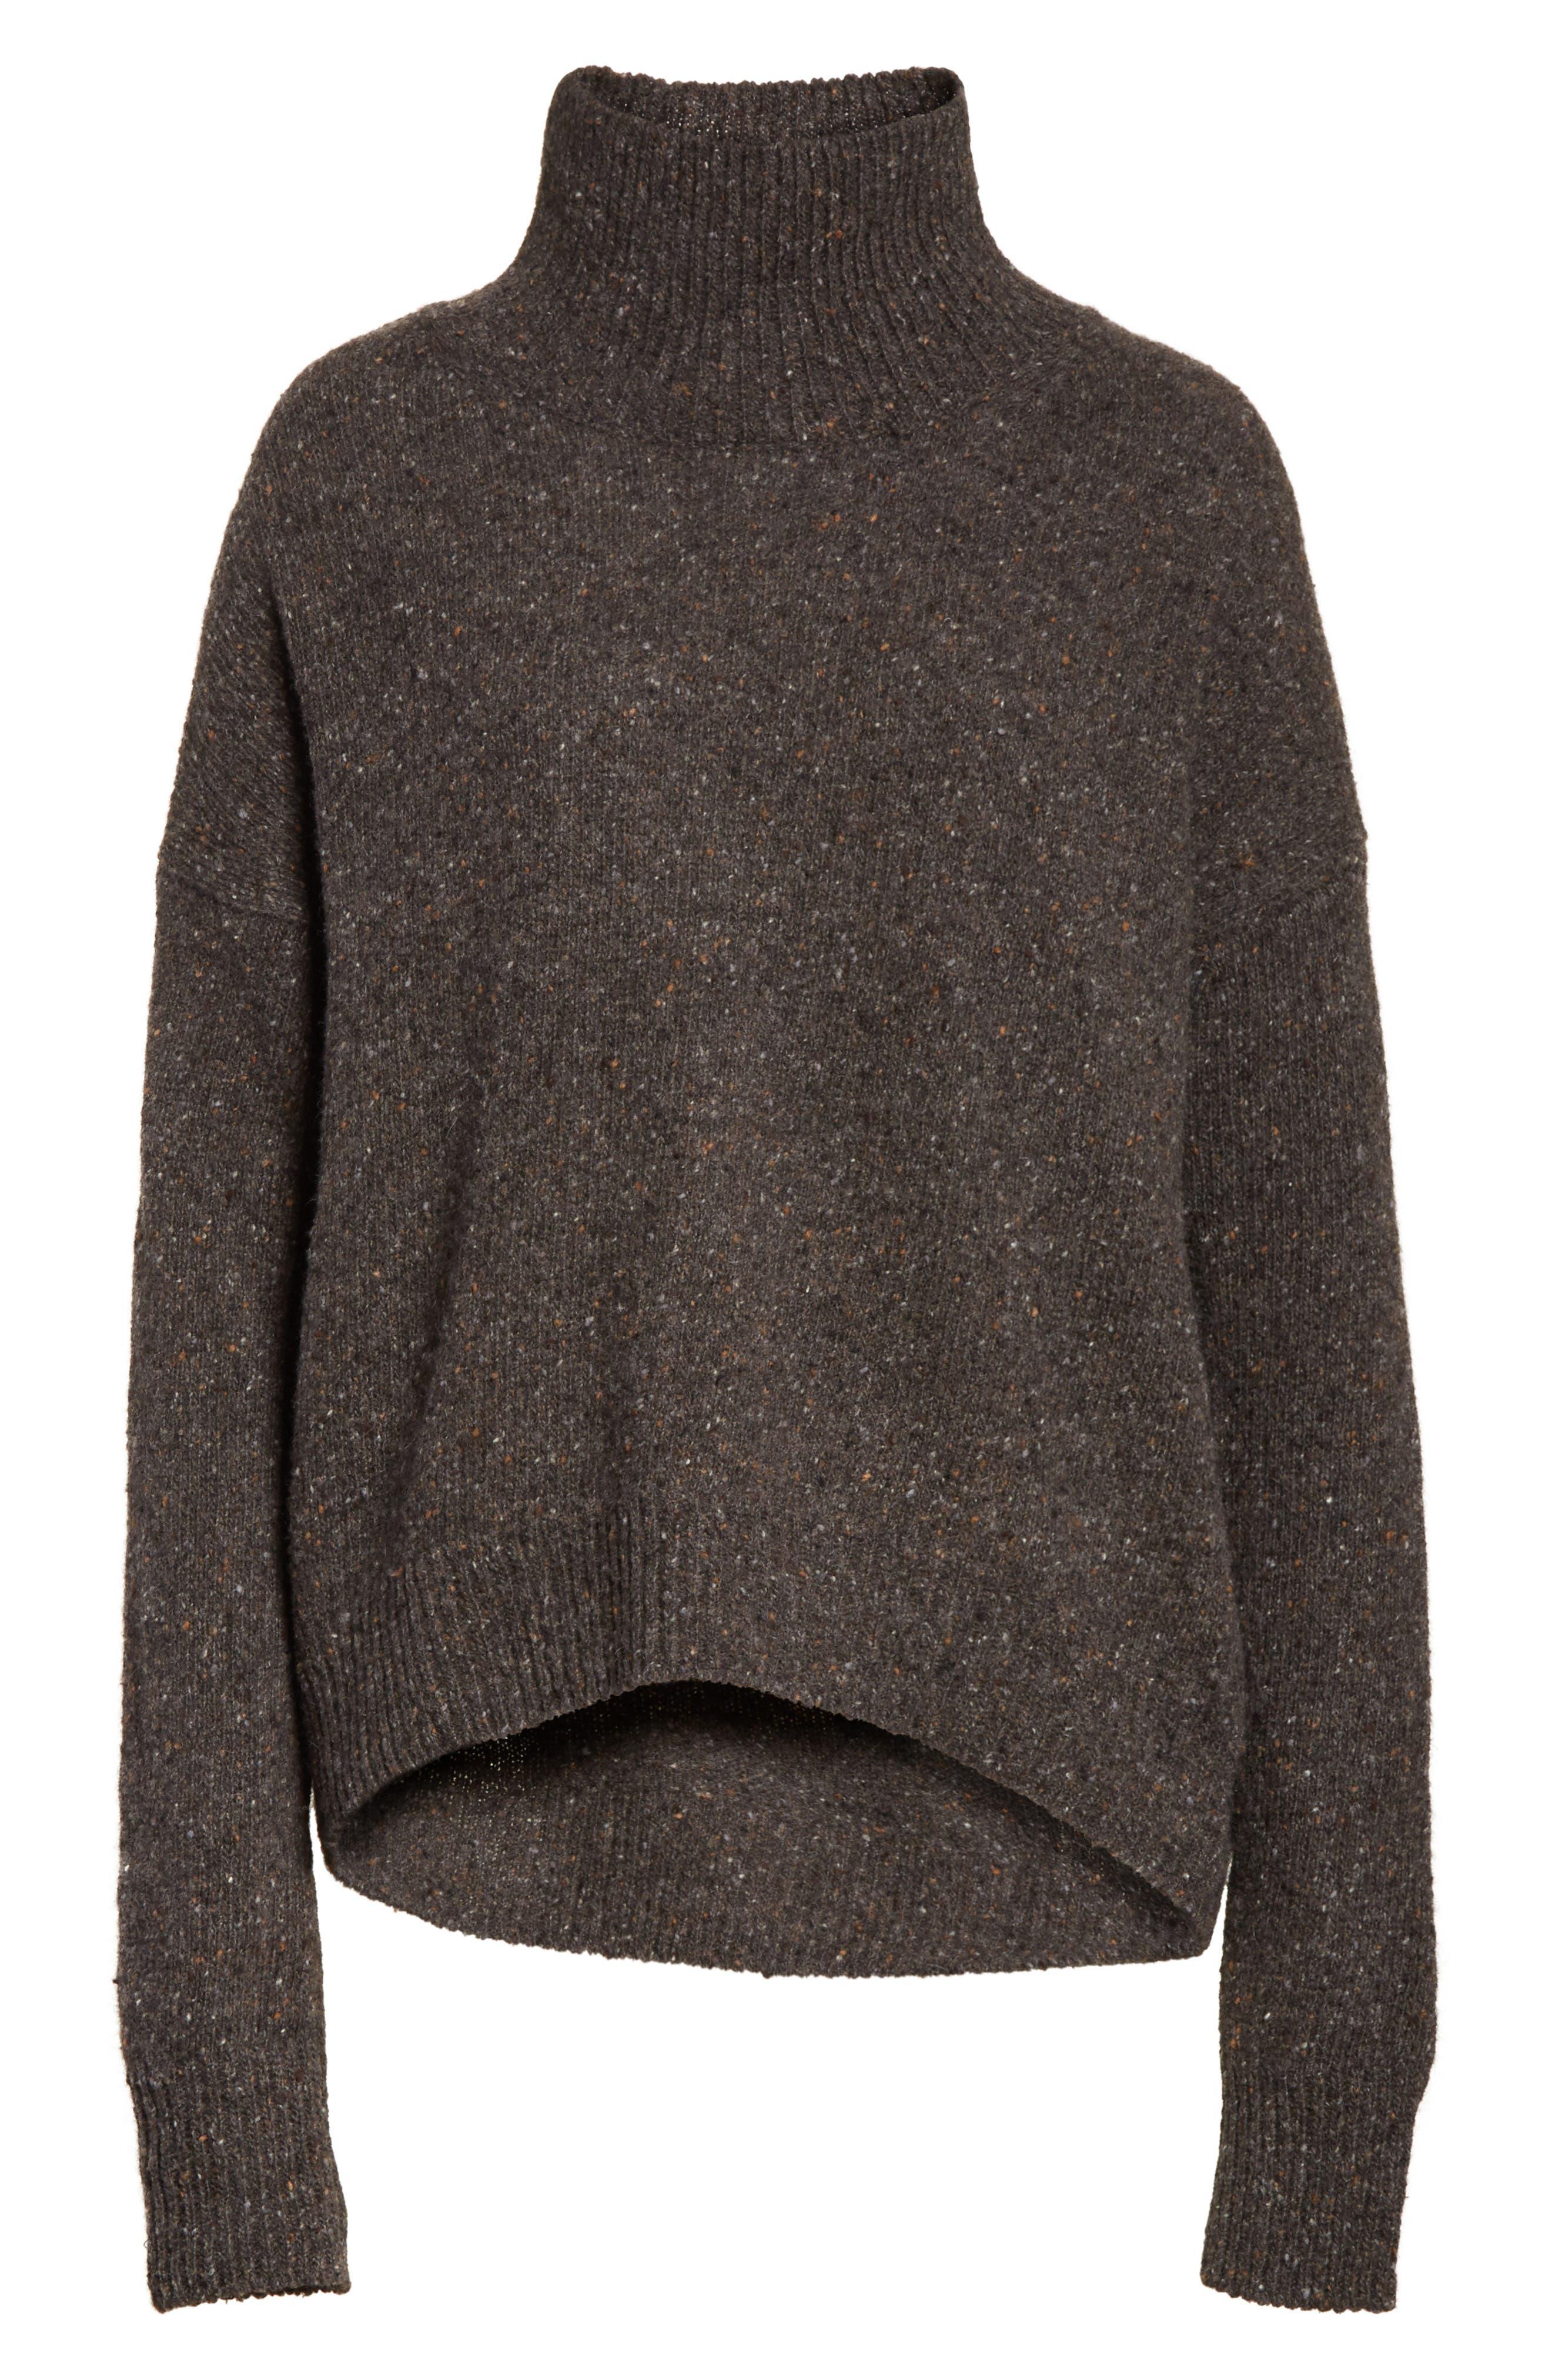 Cashmere Turtleneck Sweater,                             Alternate thumbnail 6, color,                             060